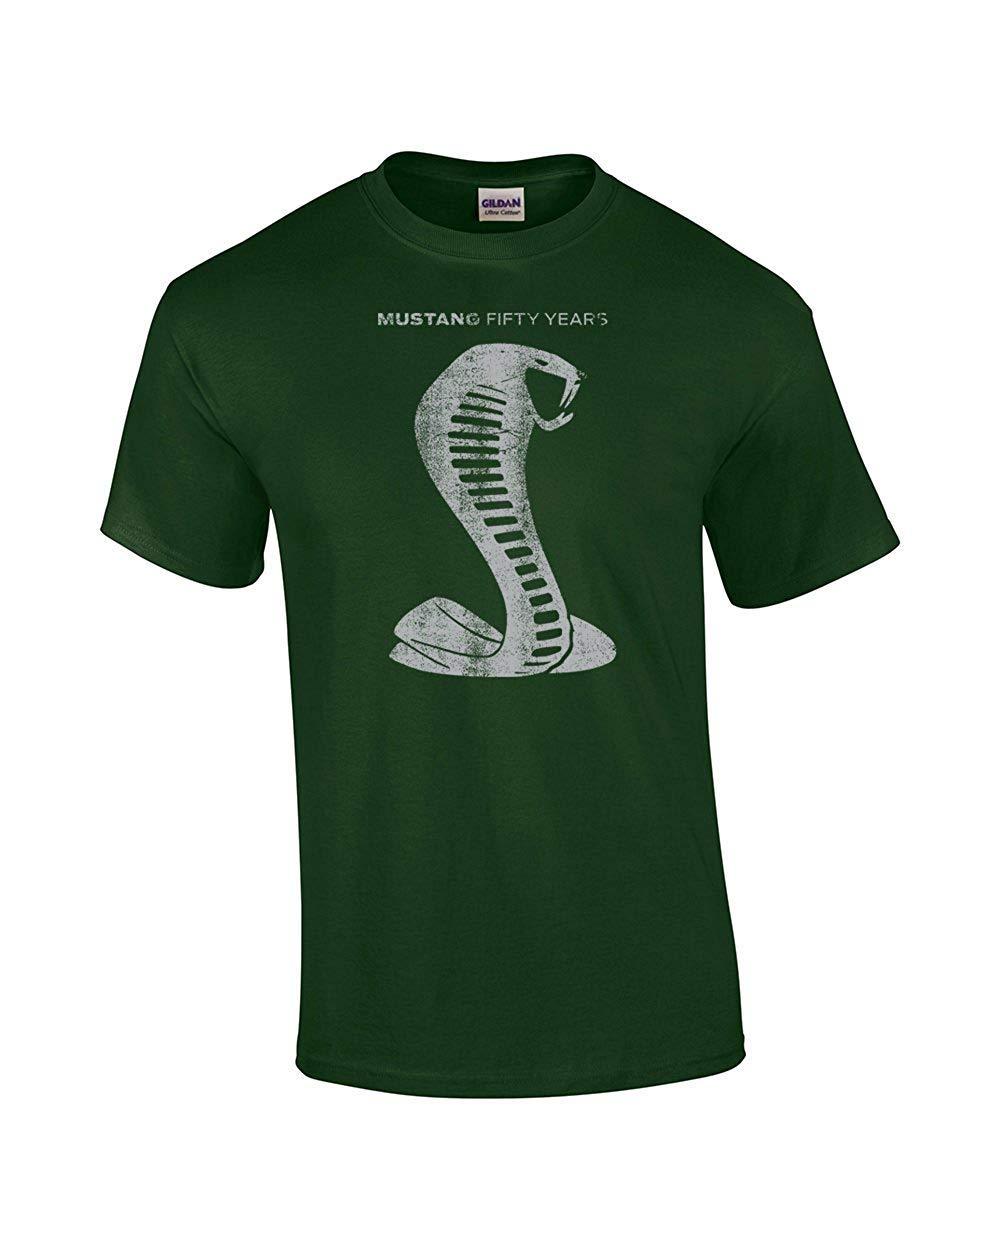 T Shirt Mustang 50 Years Cobra Fashion T Shirts 7651